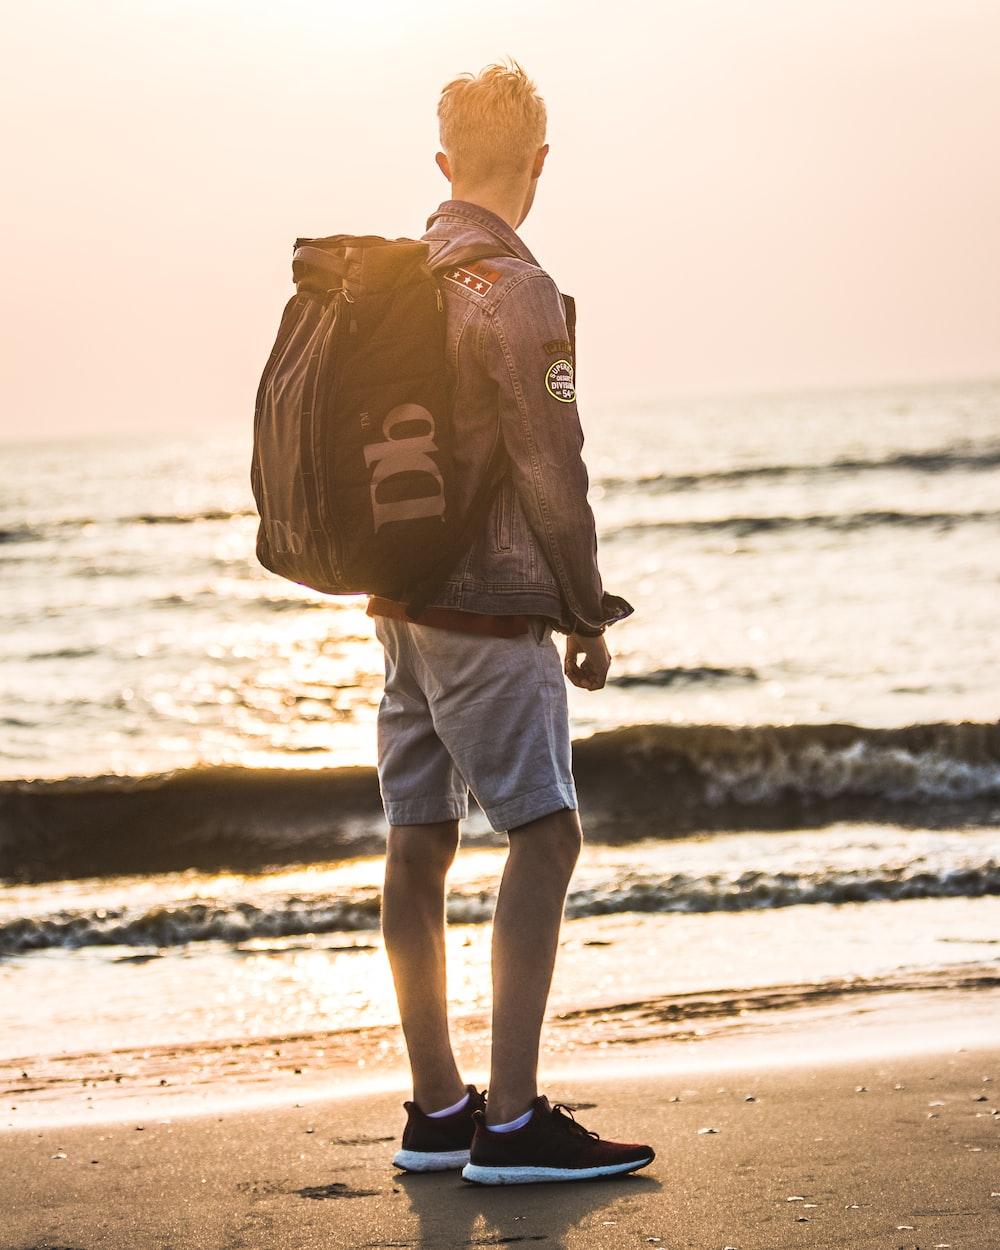 man carrying backpack standing near shoreline